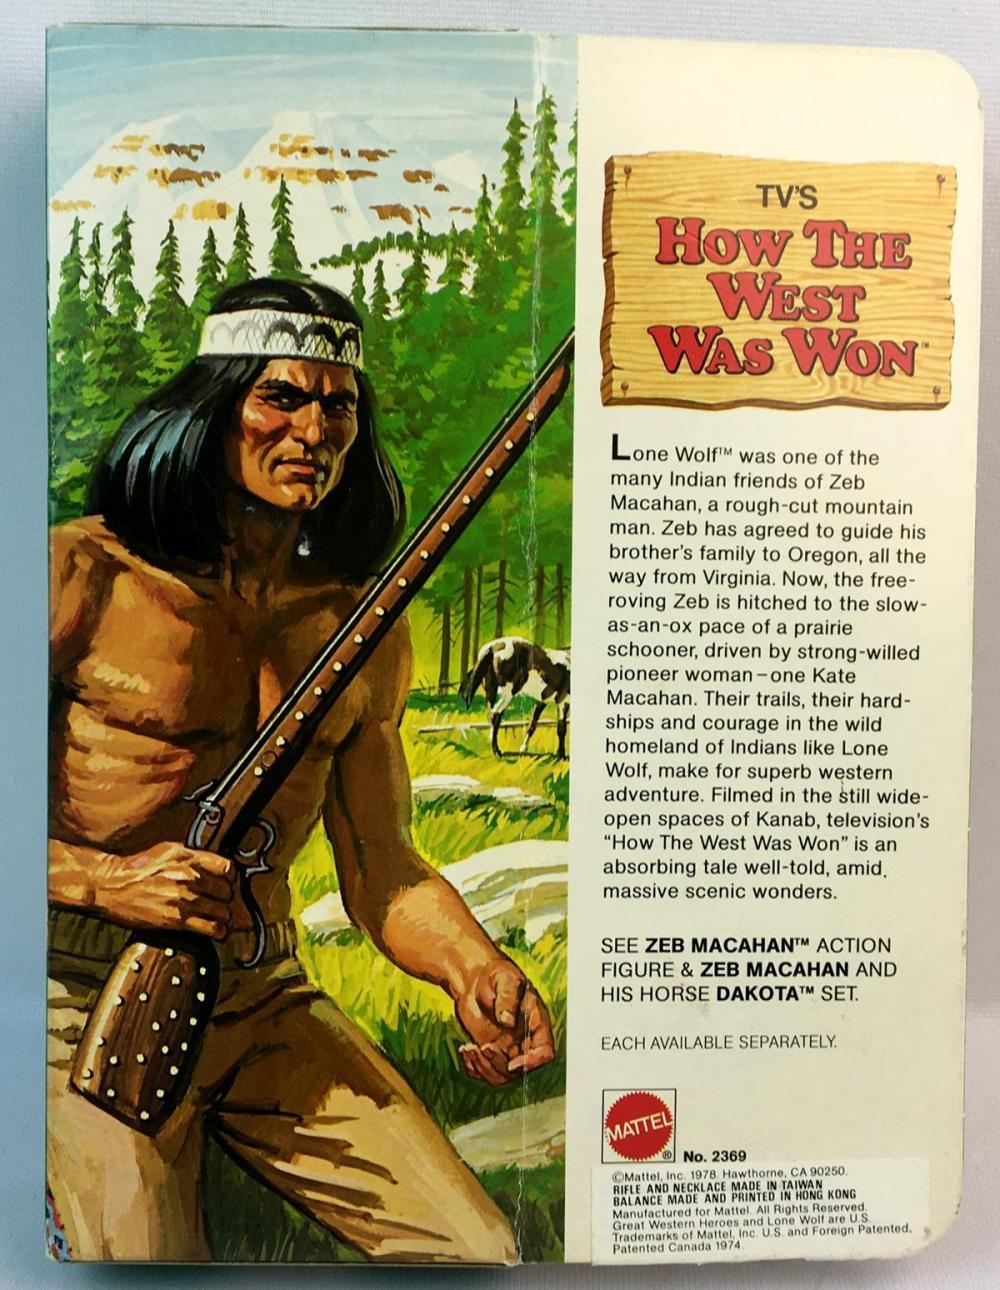 Vintage 1978 Mattel TV's How The West Was Won